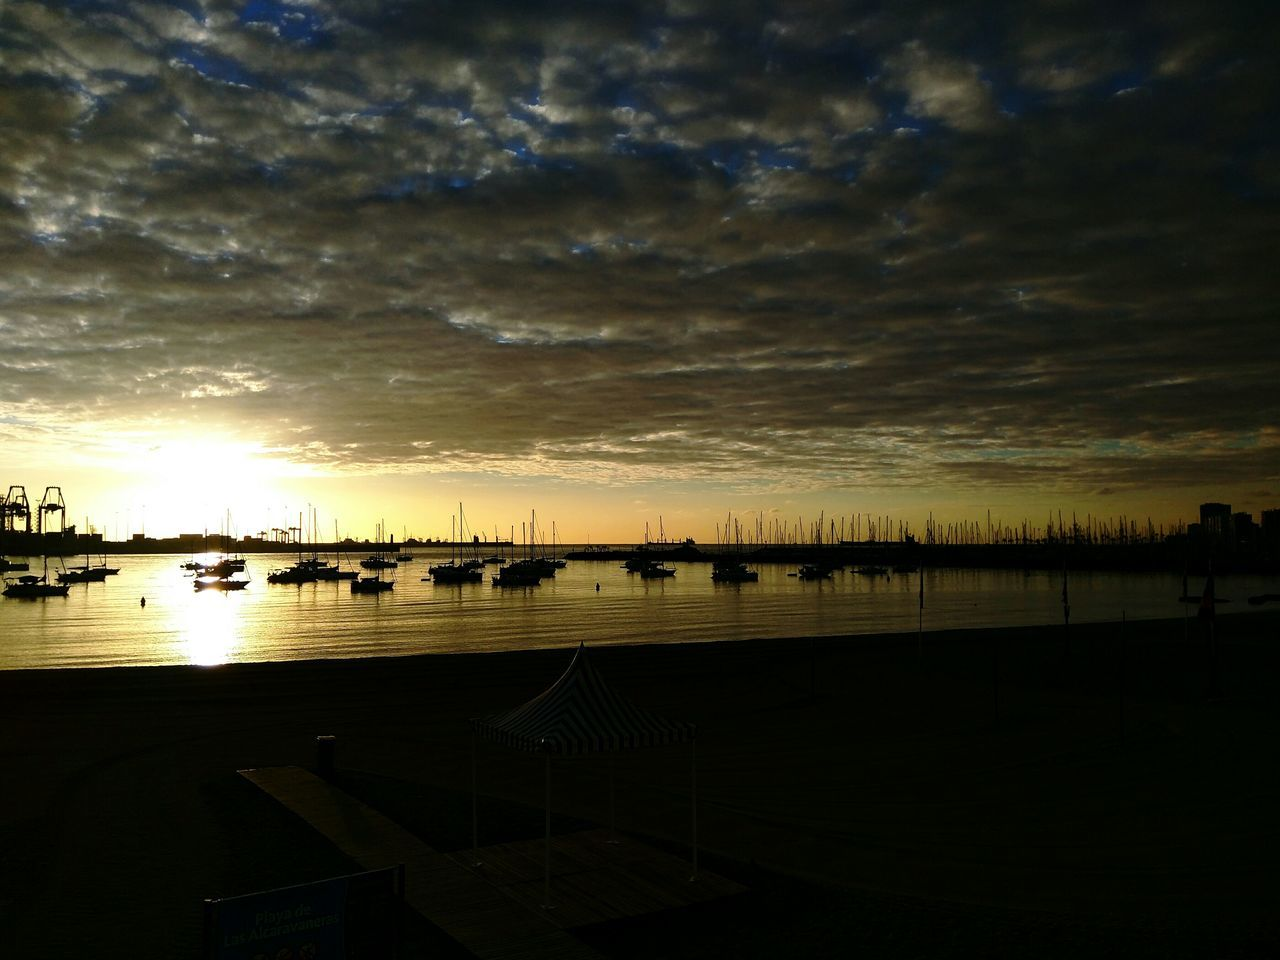 Miércoles. Mitad de semana, aguantando. Have a NicE DaY Eyeemer!! High Contrast Beachphotography Love The Sea Phonedited